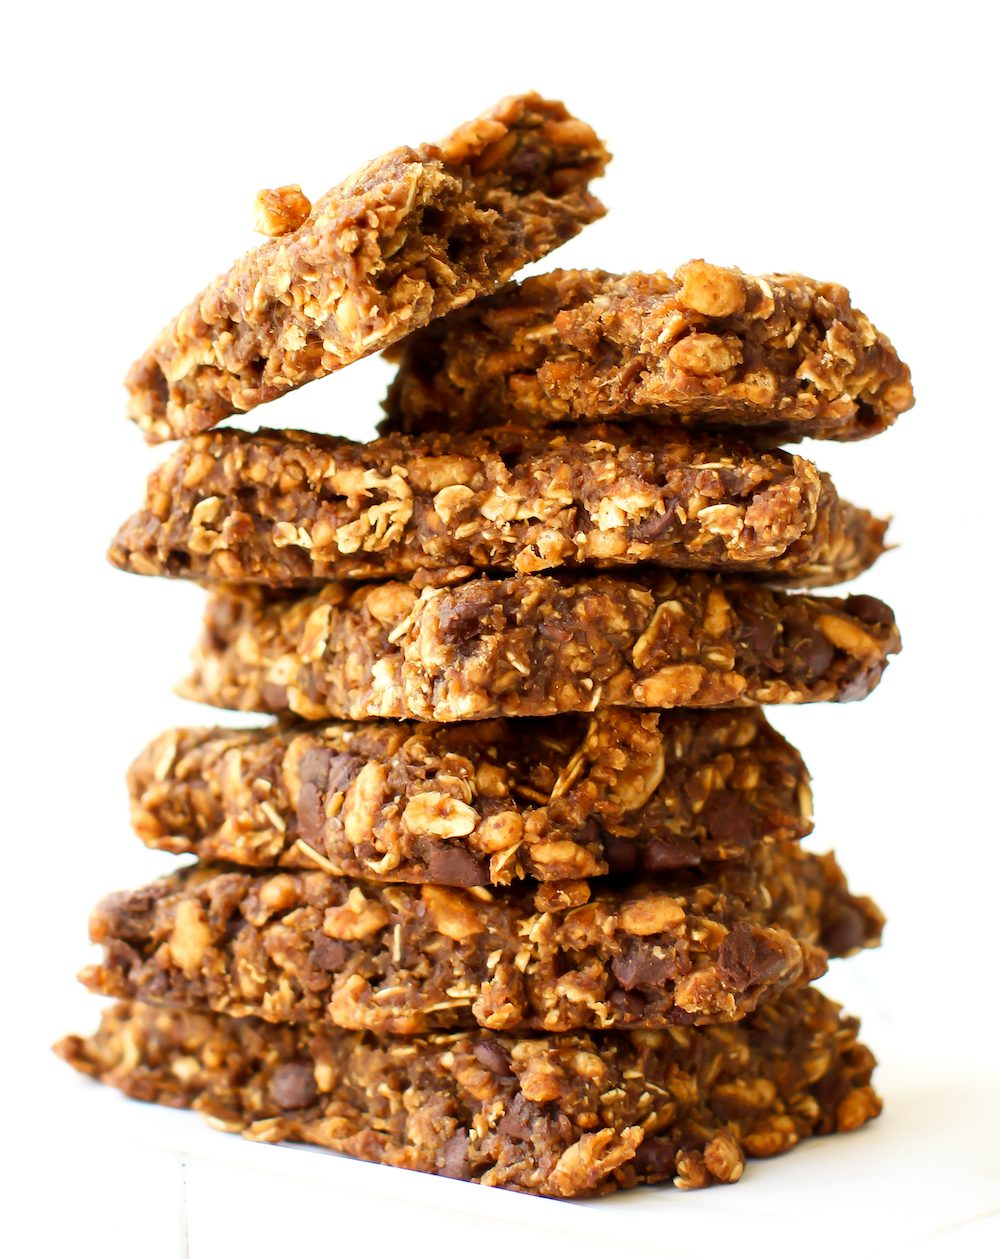 Are Chocolate Chip Clif Bars Vegan